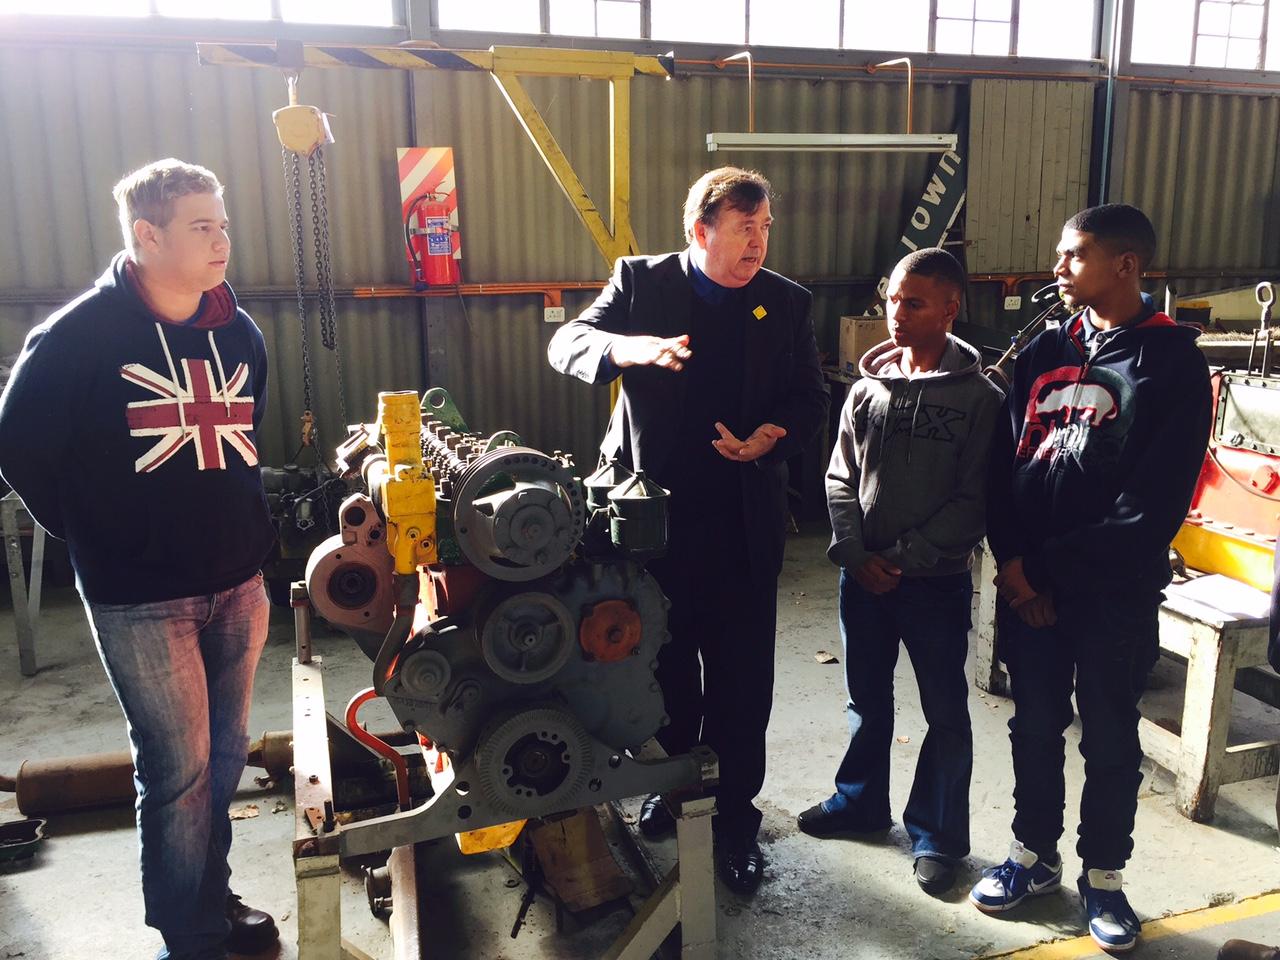 Bellville Mechanical Workshop